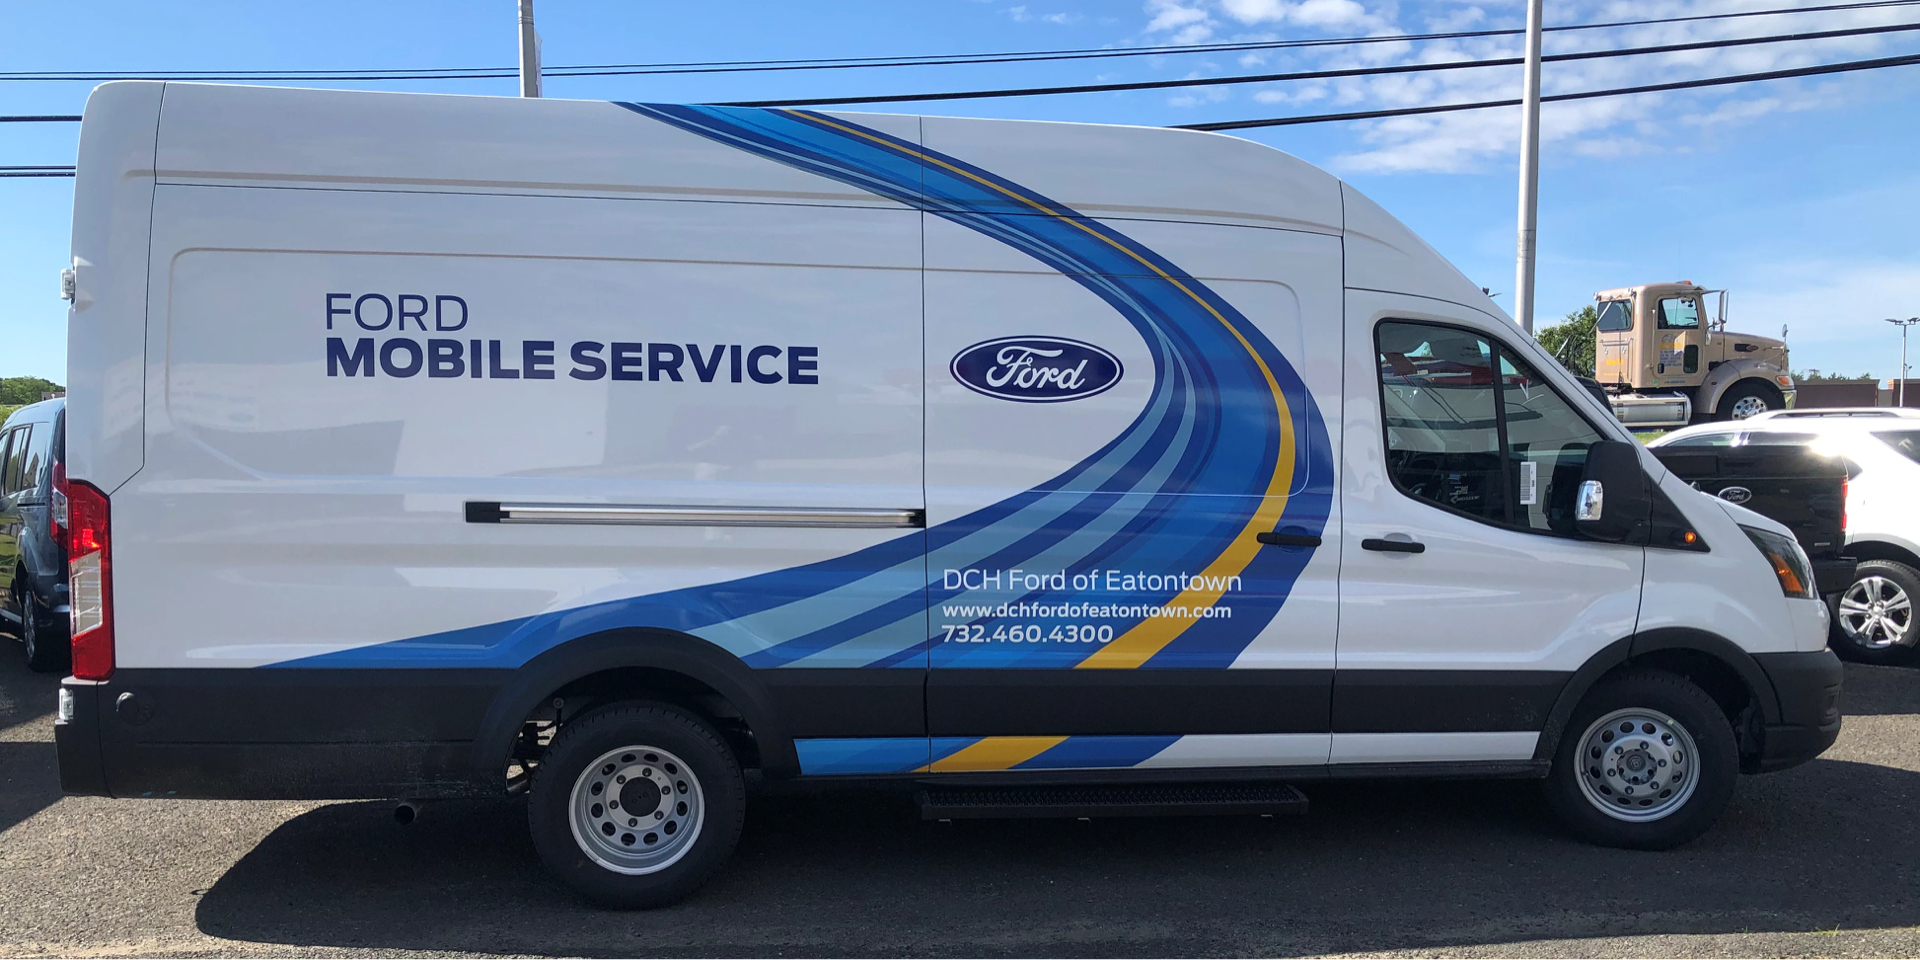 mobile-service-van-parked